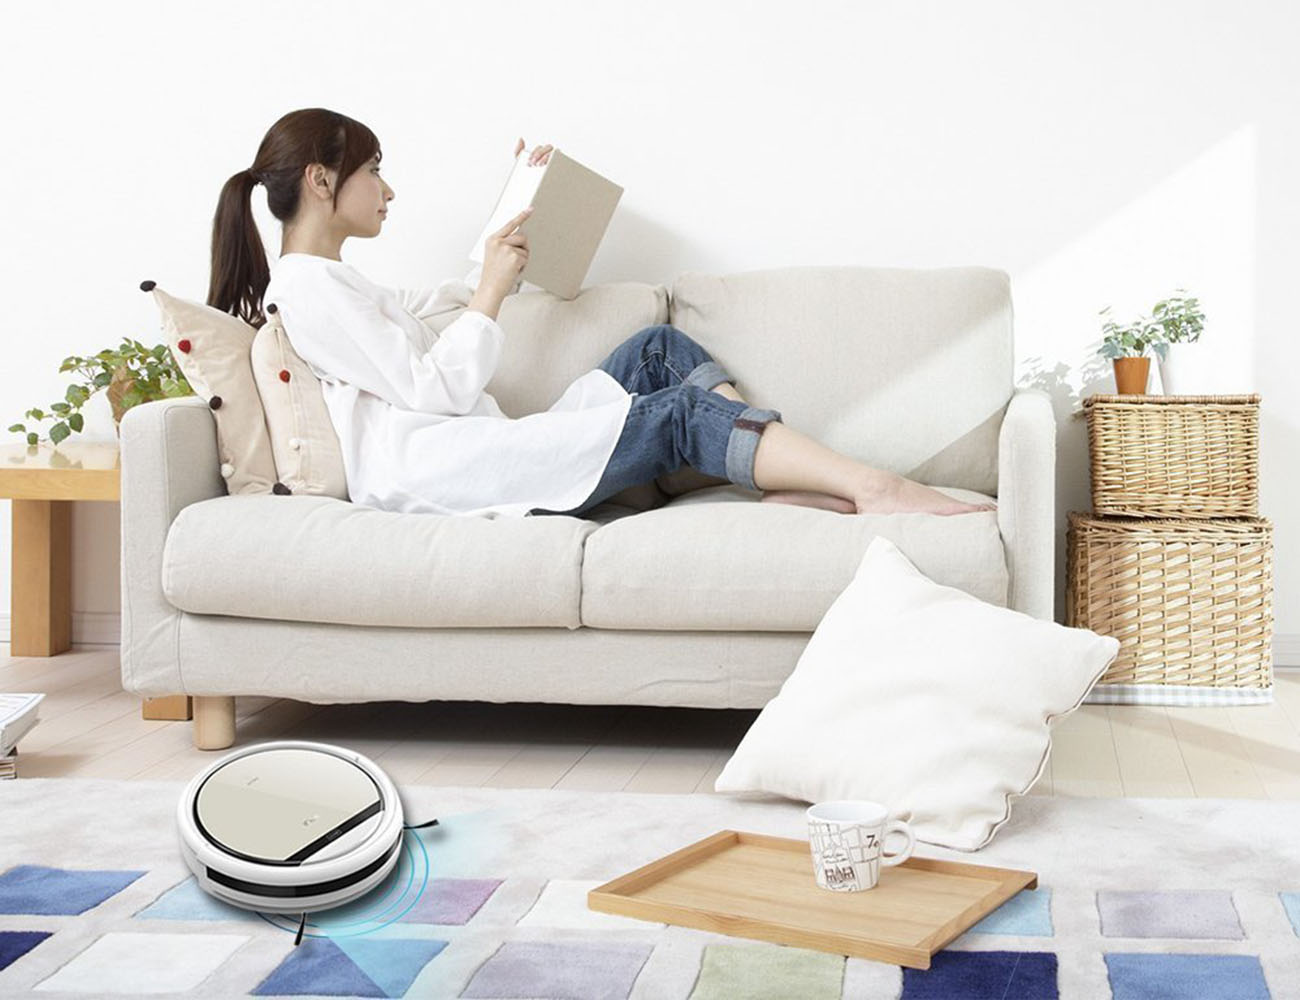 Chuwi+Ilife+V5+Pro+Intelligent+Robotic+Vacuum+Cleaner